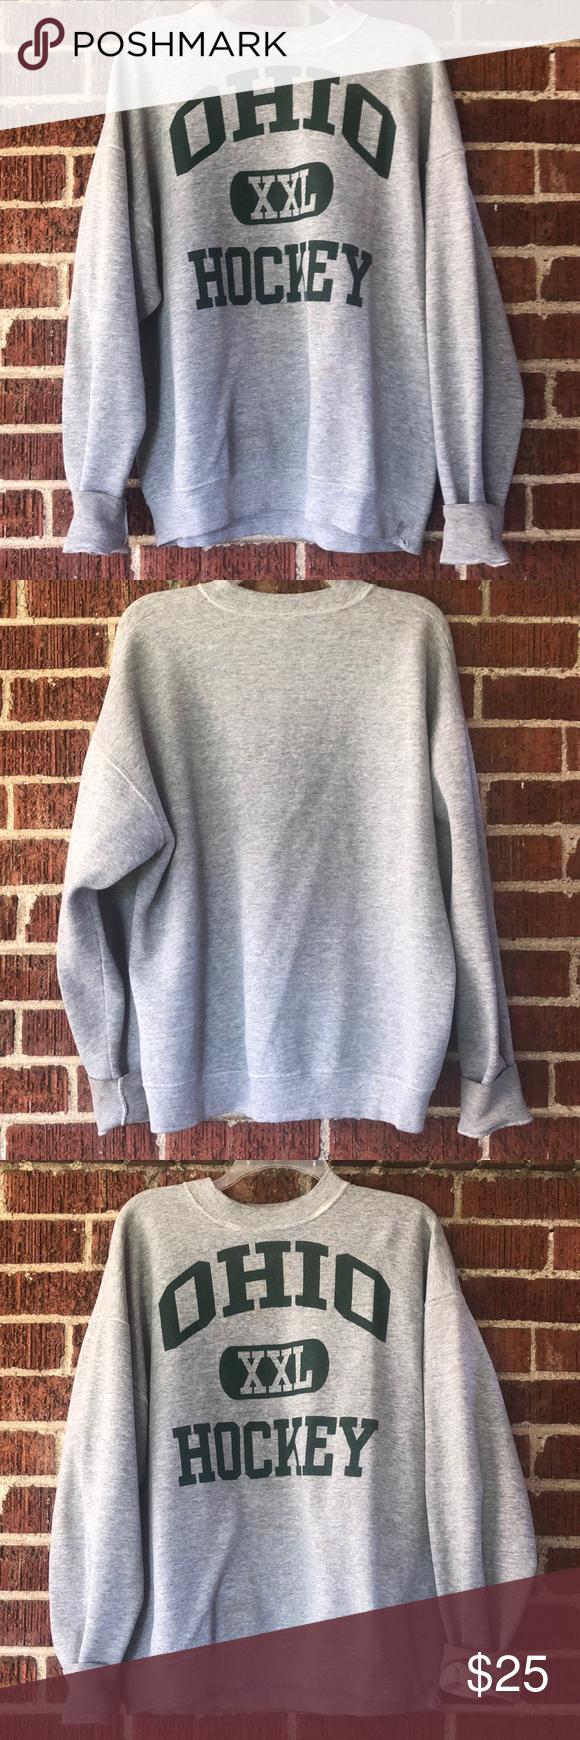 Vintage Ohio University Hockey Crew Sweatshirt Sweatshirts Crew Sweatshirts Vintage Sweatshirt [ 1740 x 580 Pixel ]